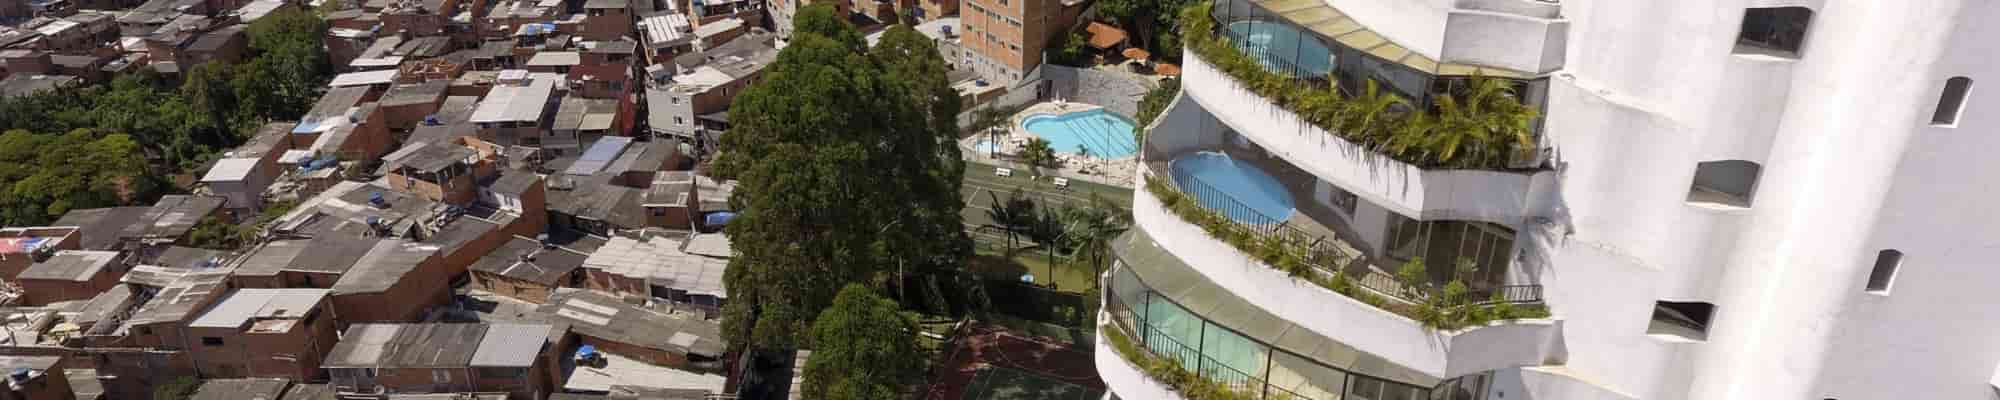 Favela in South America